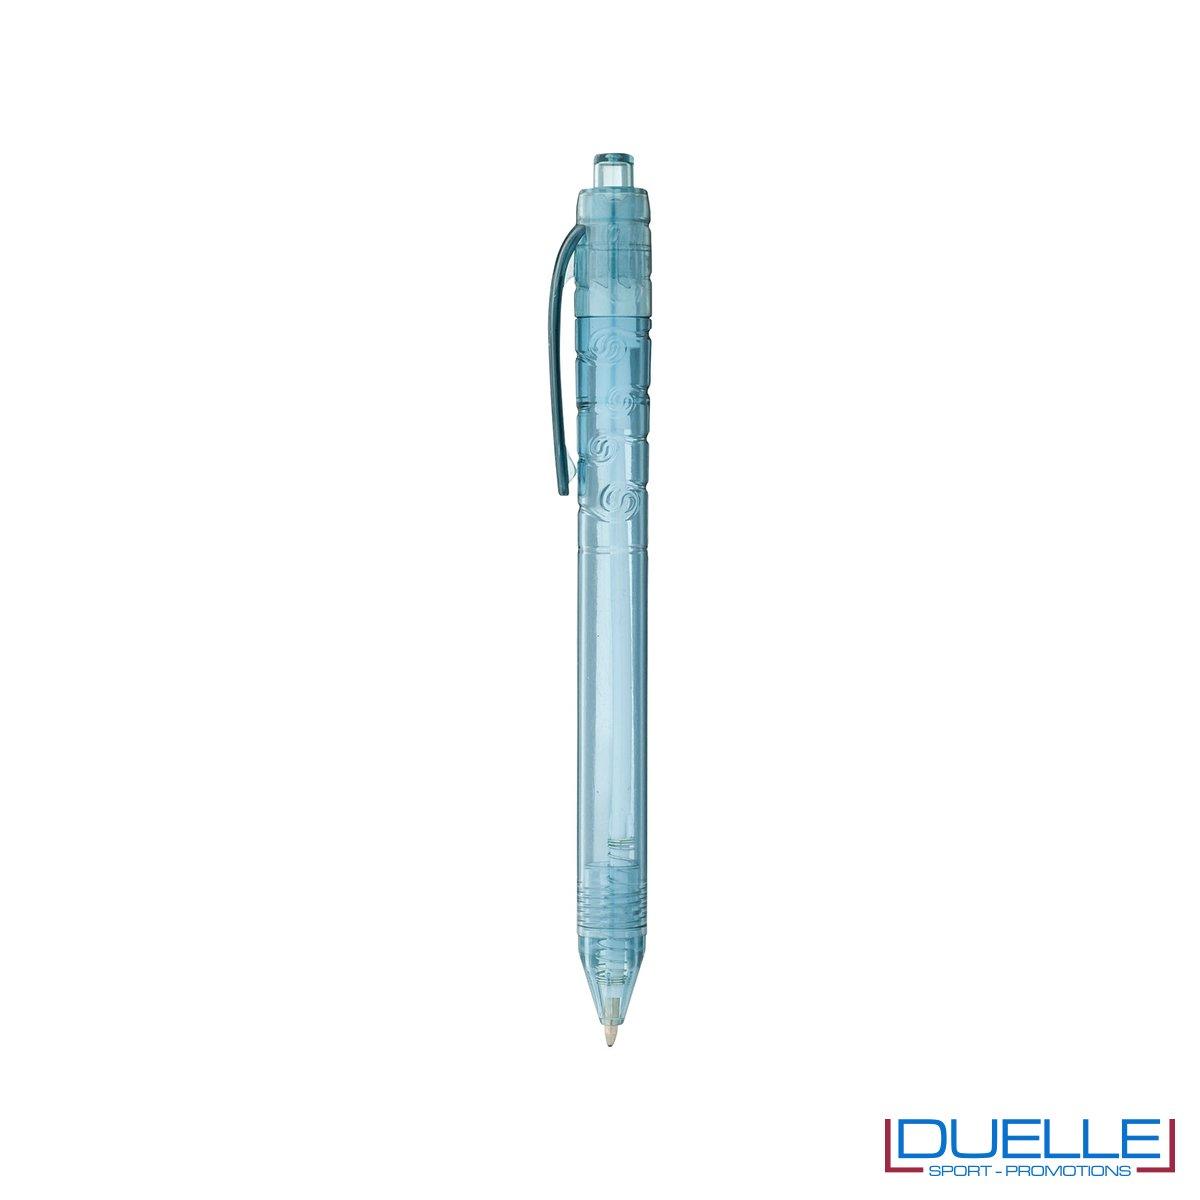 Penna in plastica riciclata PET colore blu trasparente